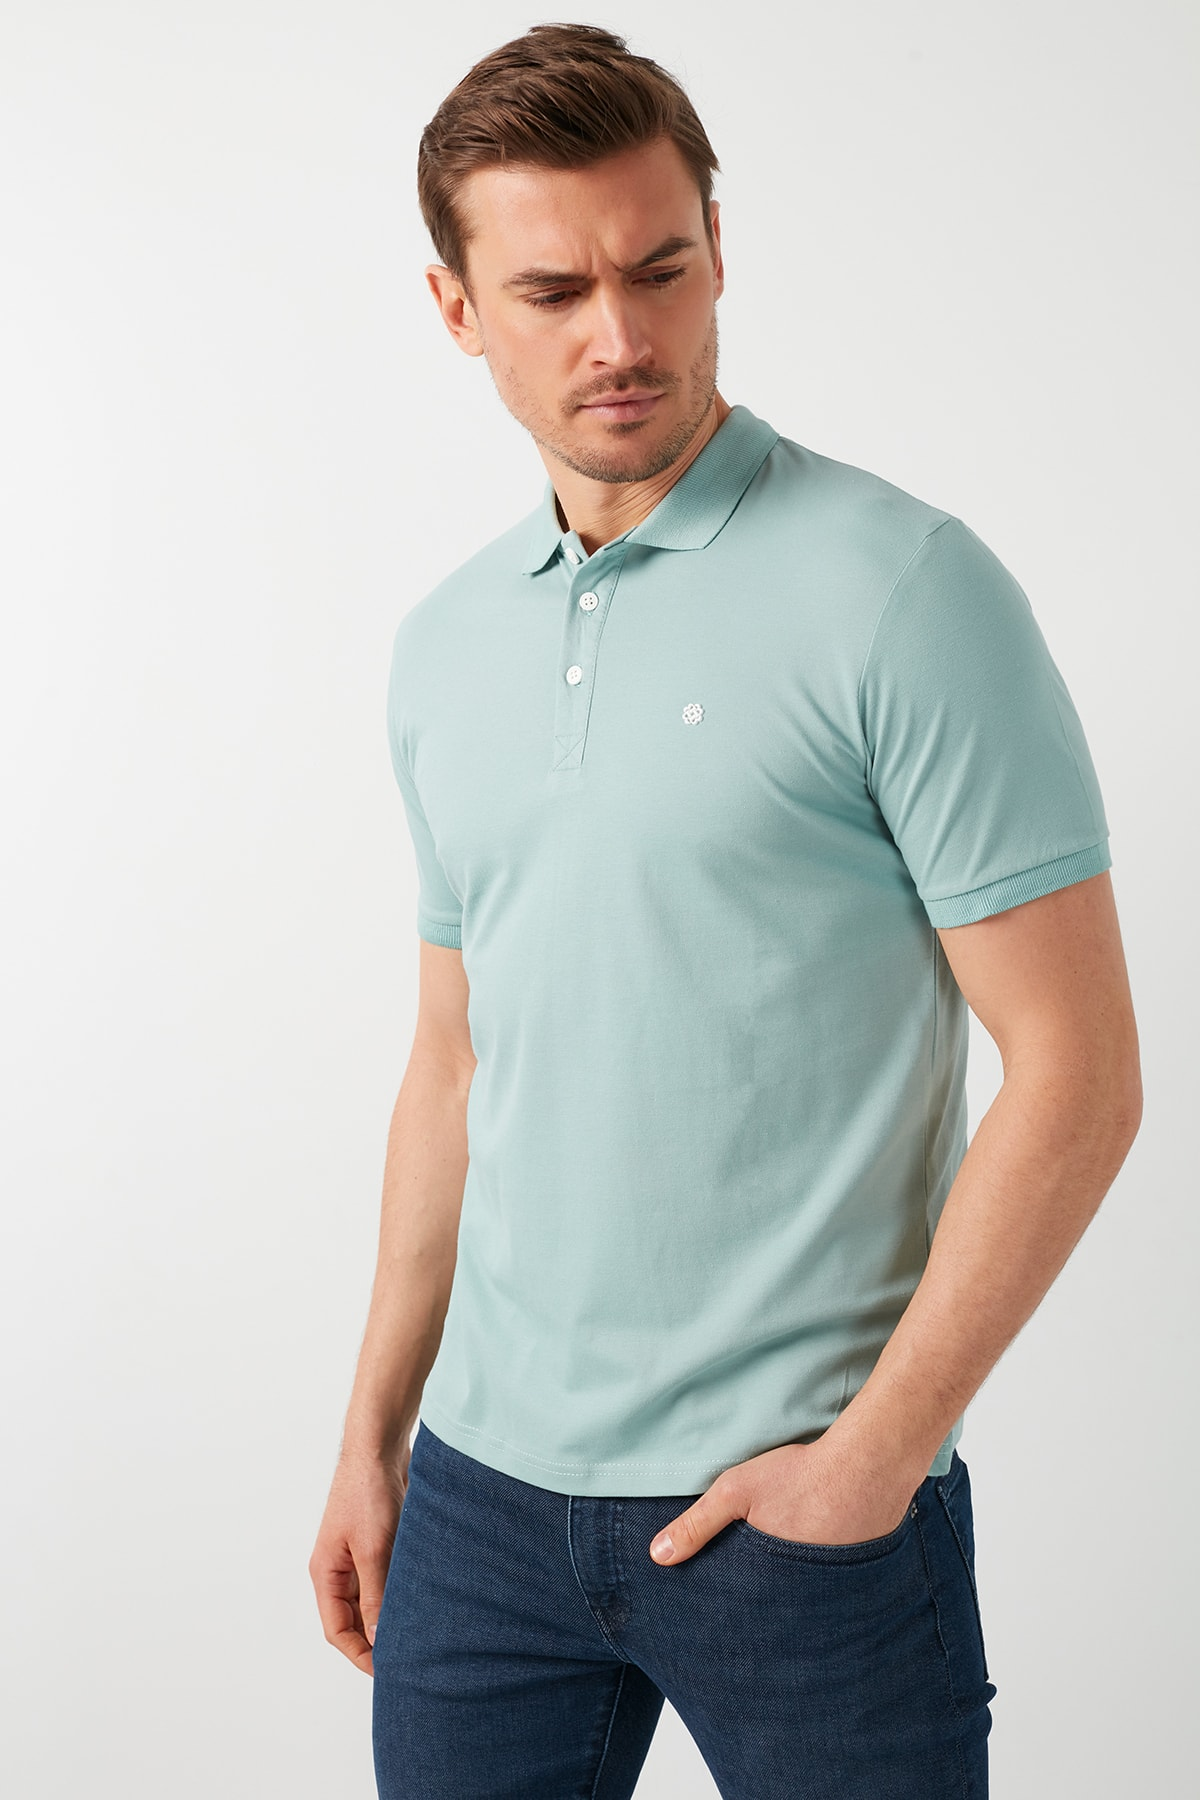 Buratti Pamuklu Düğmeli Polo T Shirt 0438101 1